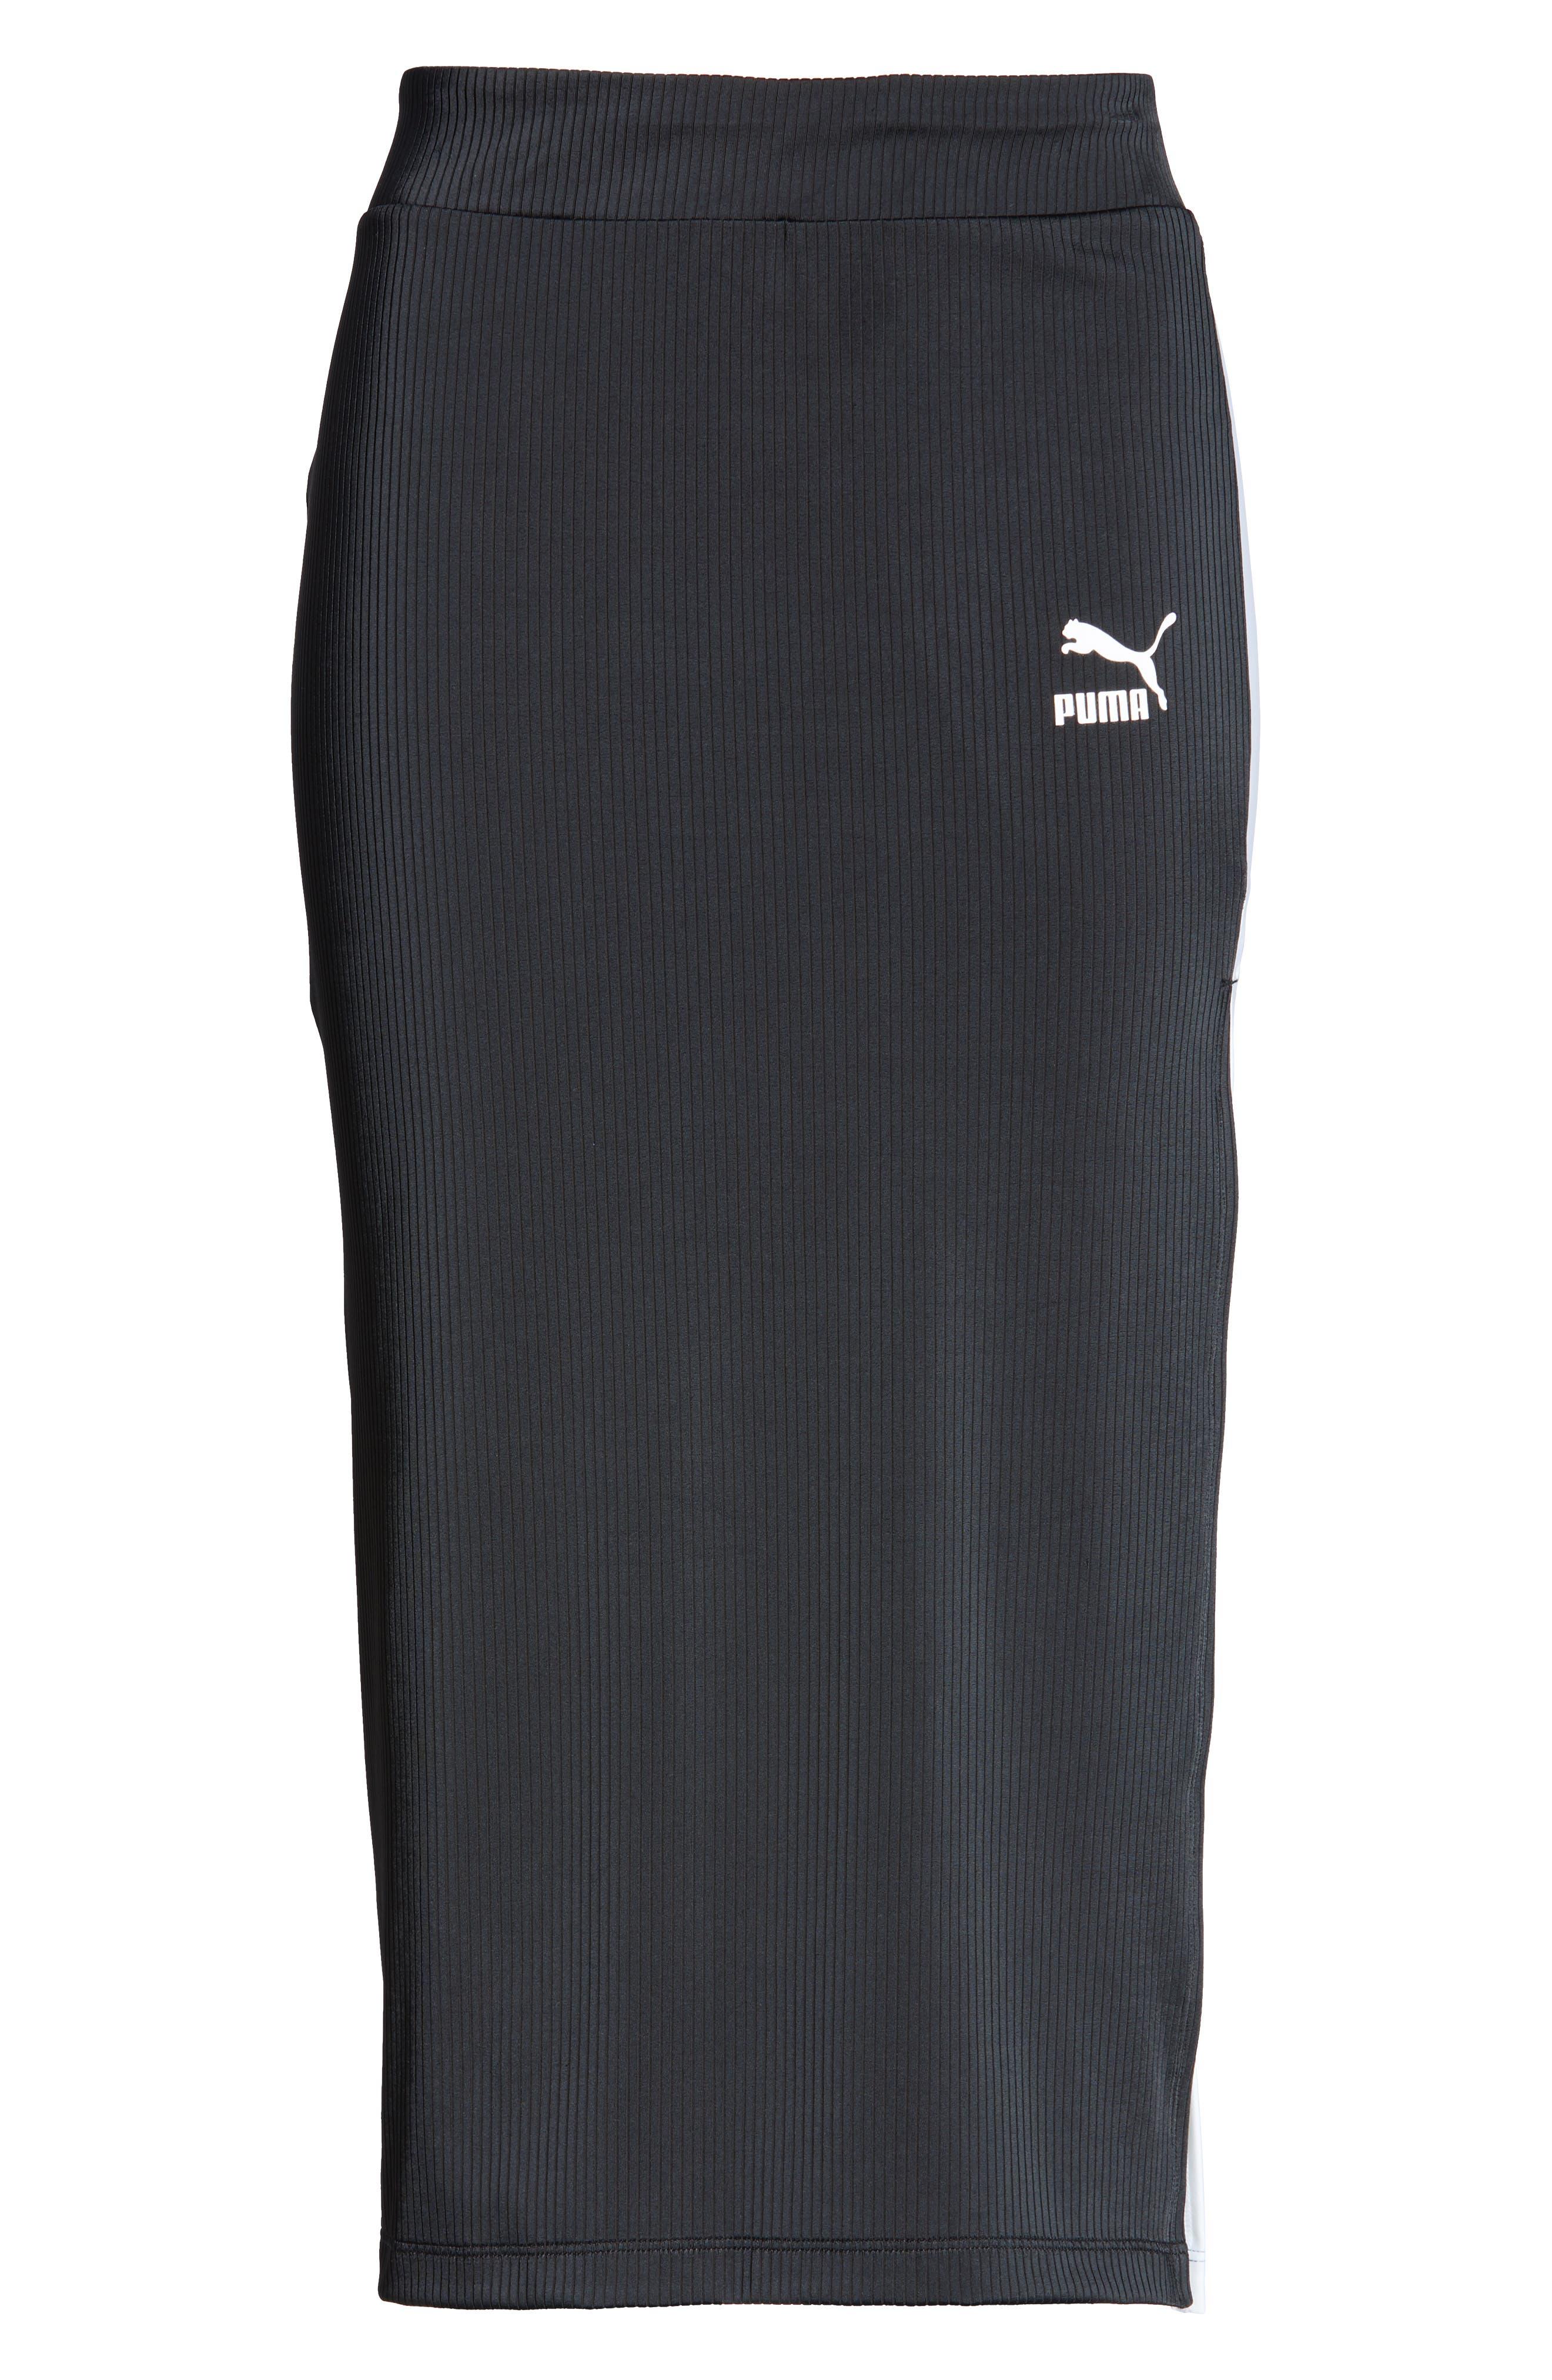 PUMA, Classics Ribbed Skirt, Alternate thumbnail 7, color, 001